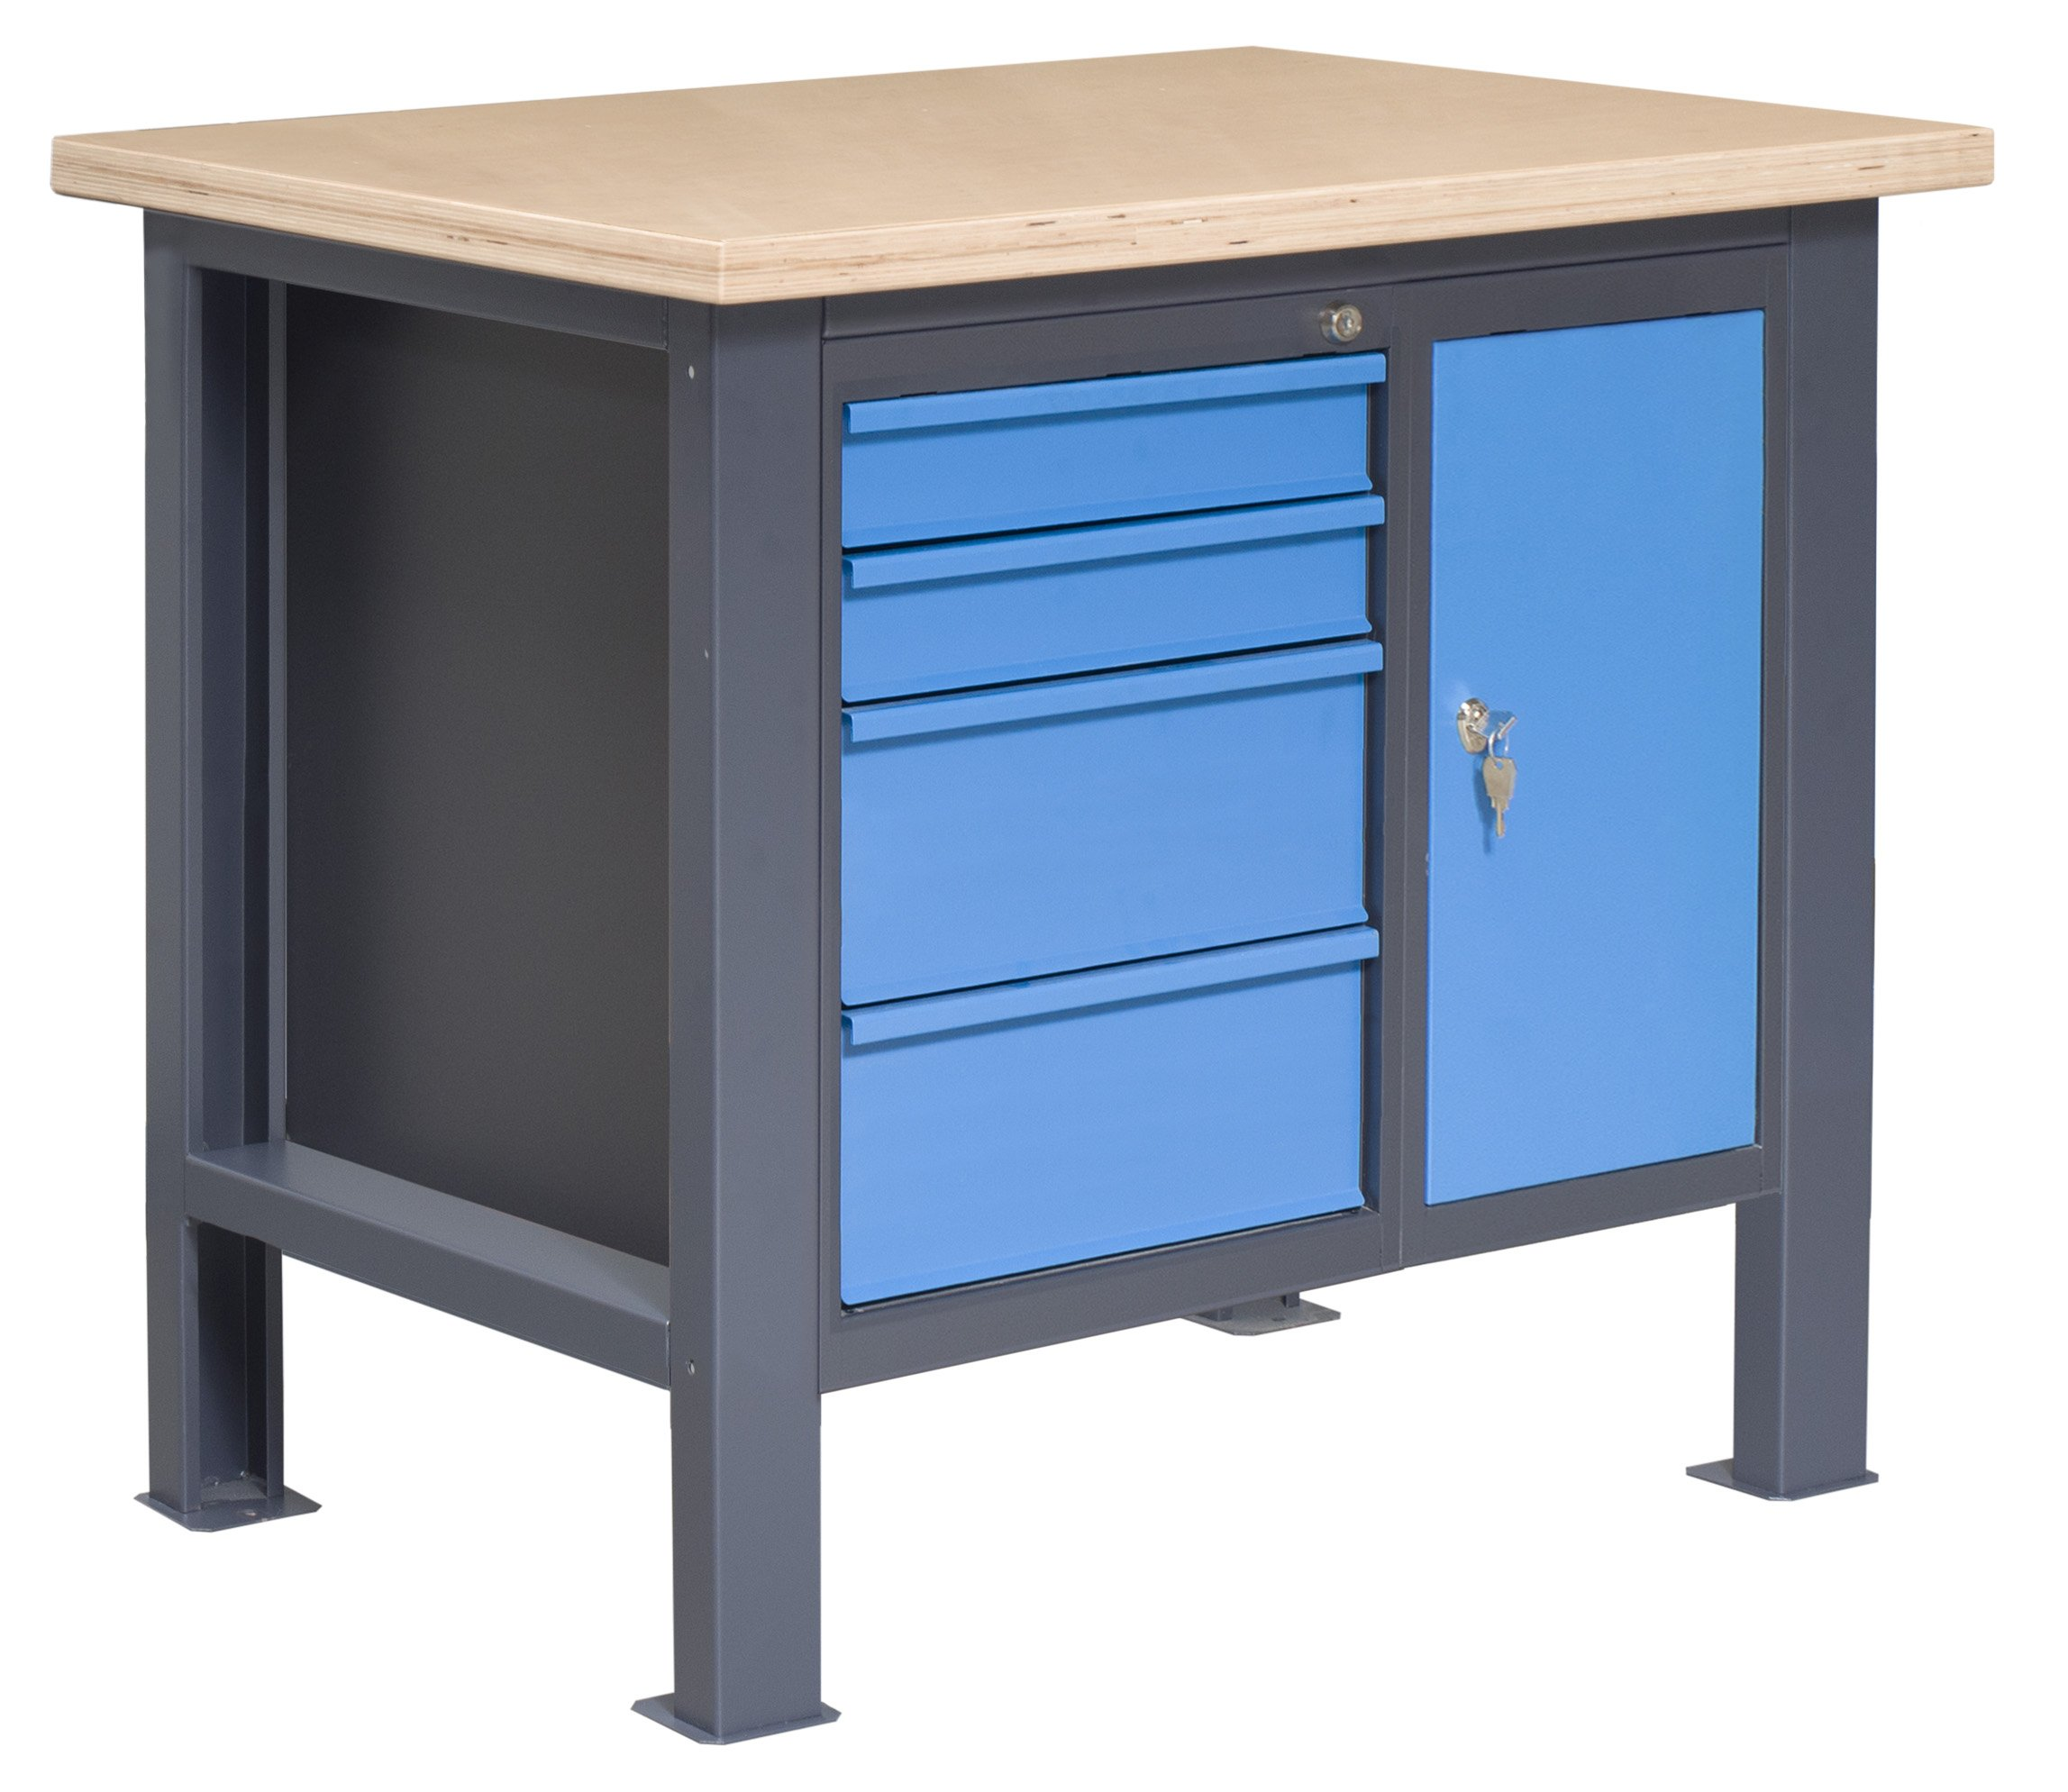 Stół warsztatowy PL01L/P7P9